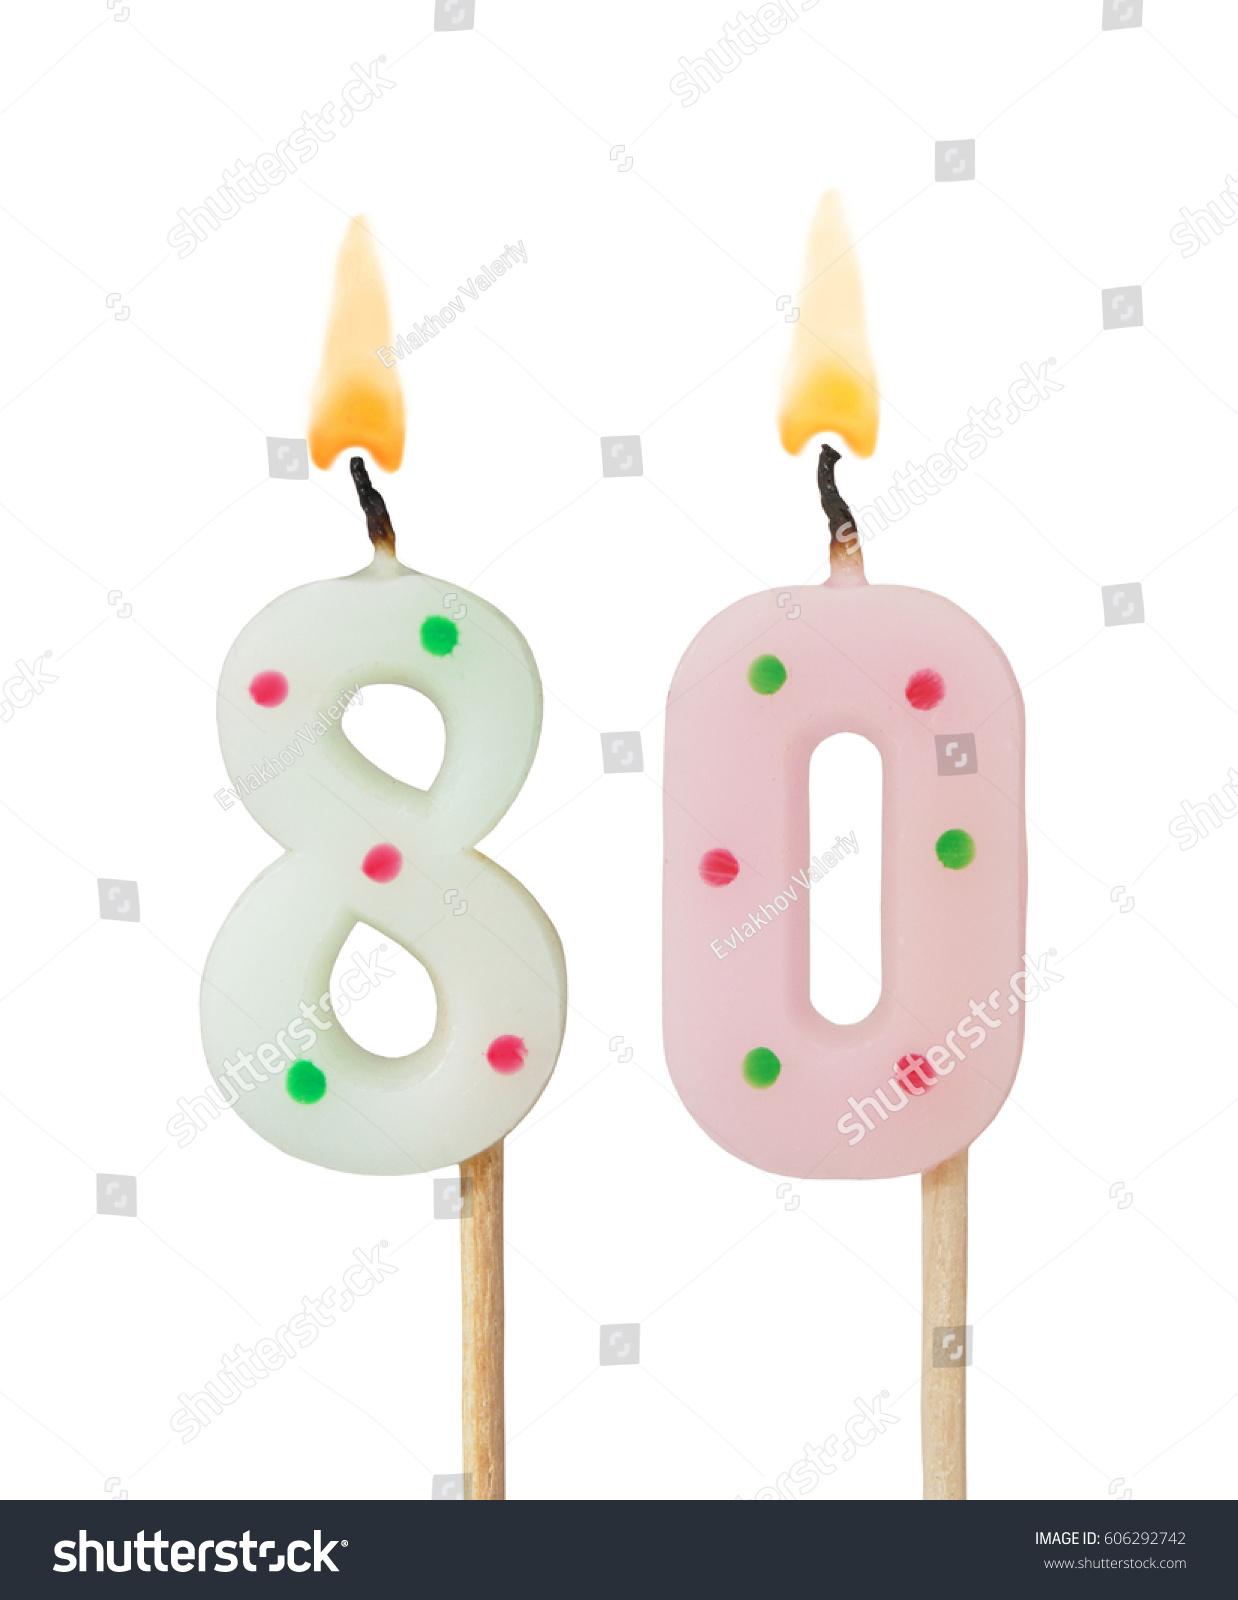 Burning Birthday Candles Isolated On White Background Number 80